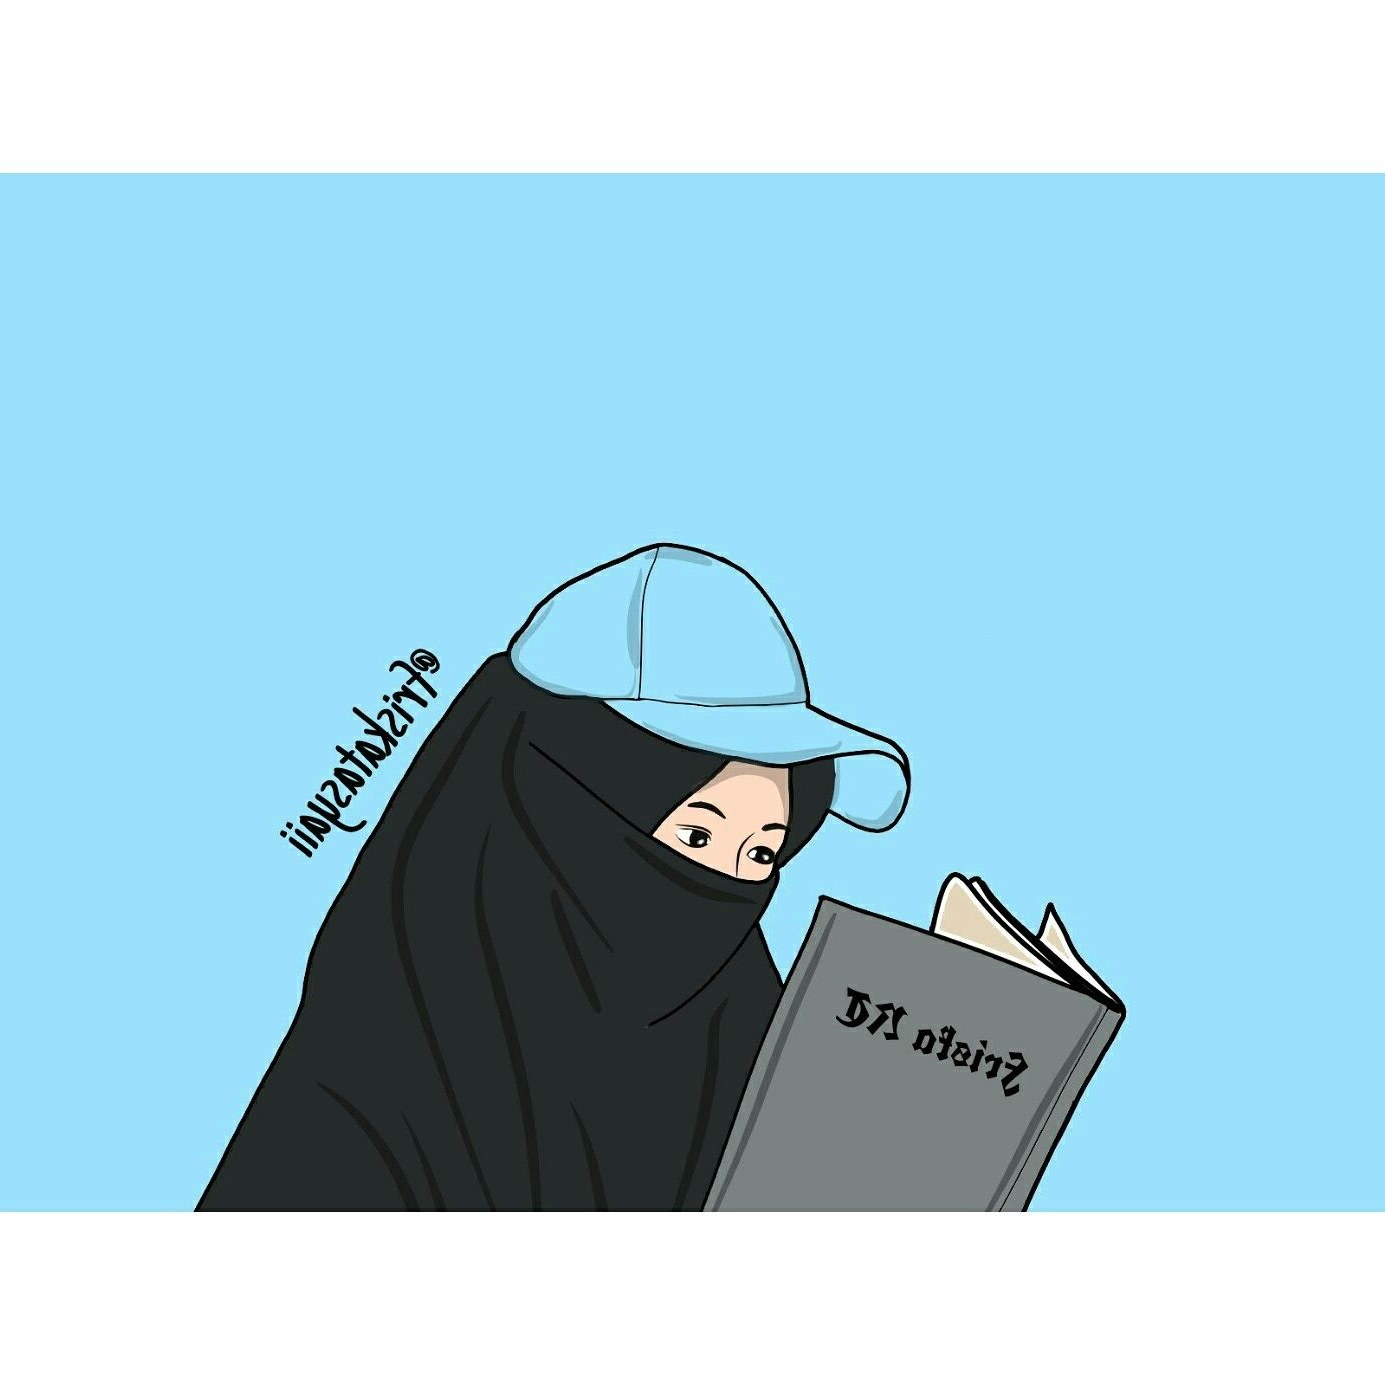 Design Muslimah Bercadar Kartun H9d9 Gambar Kartun Muslimah Modern Cari Gambar Keren Hd